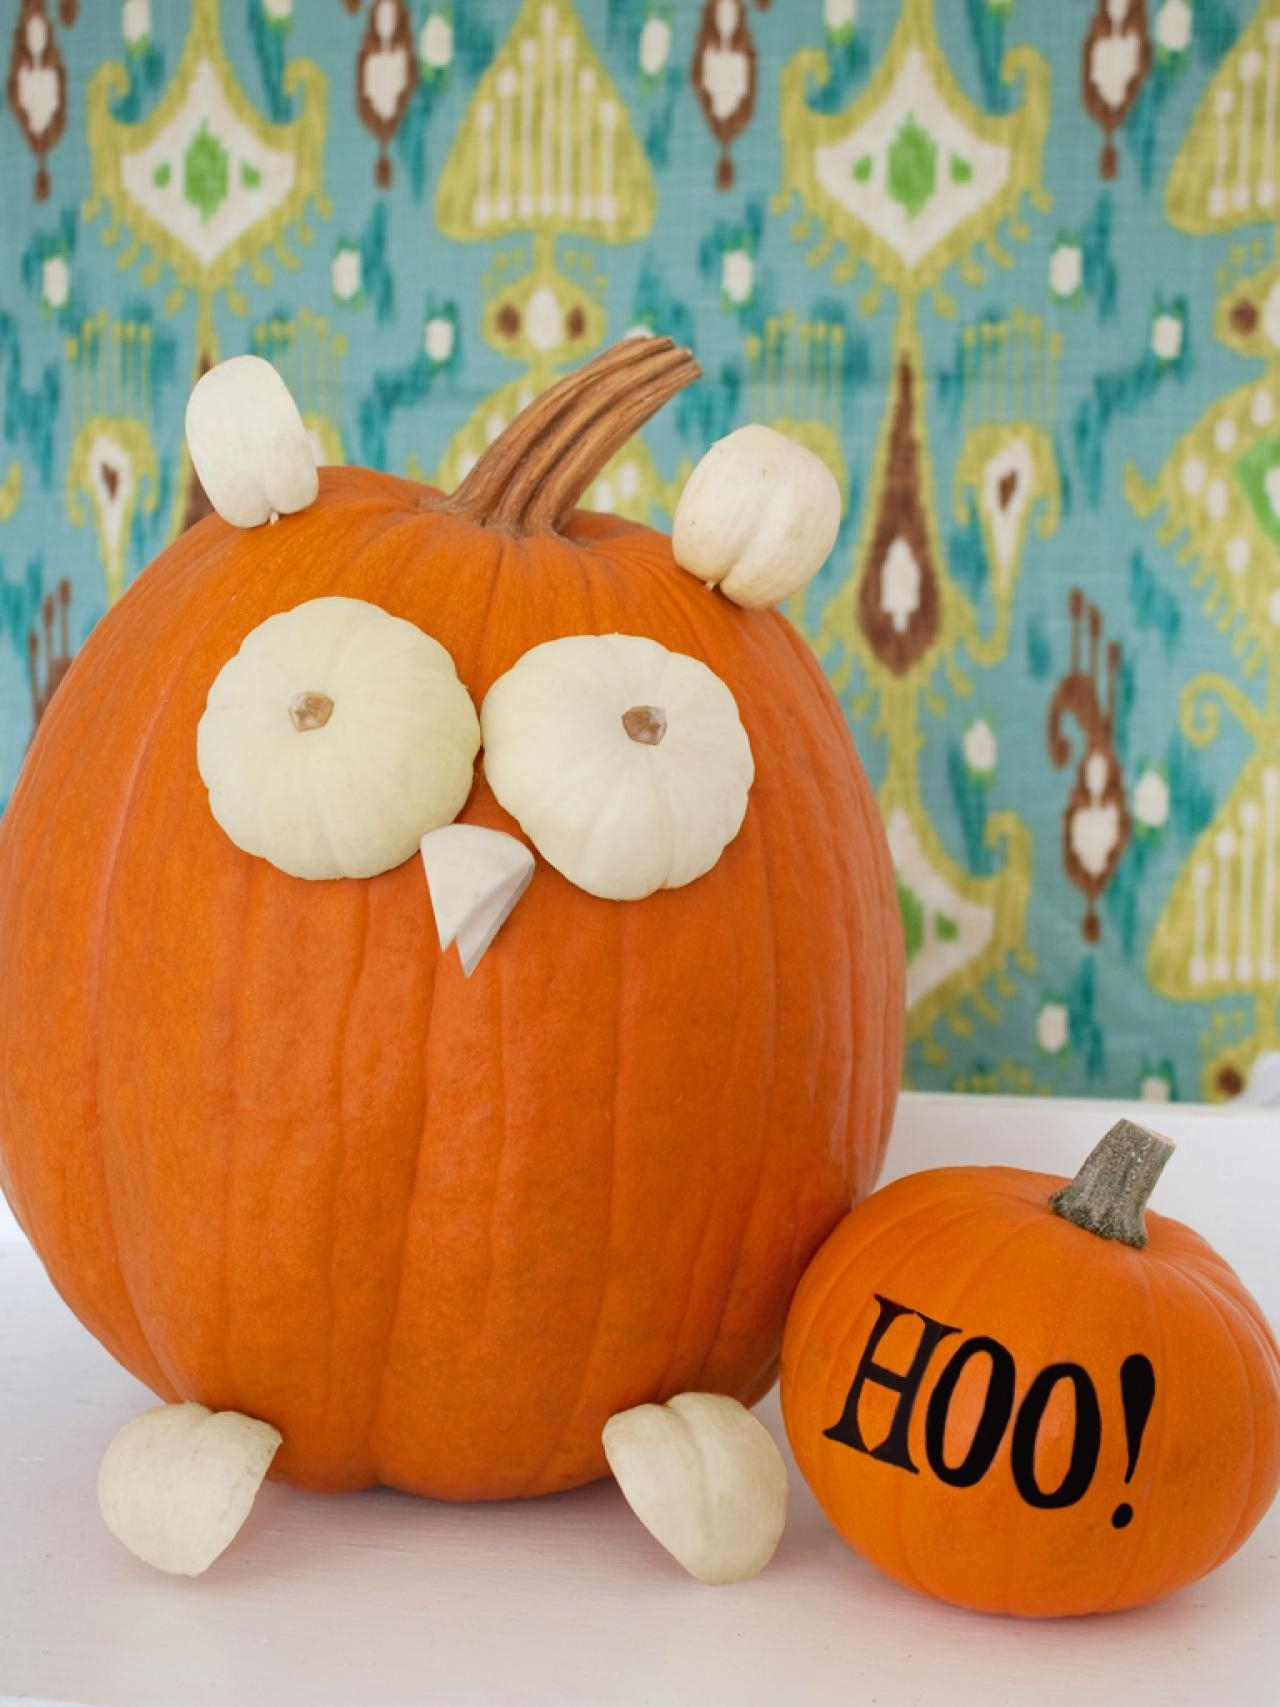 10 Fashionable Creative Pumpkin Ideas No Carving %name 2020